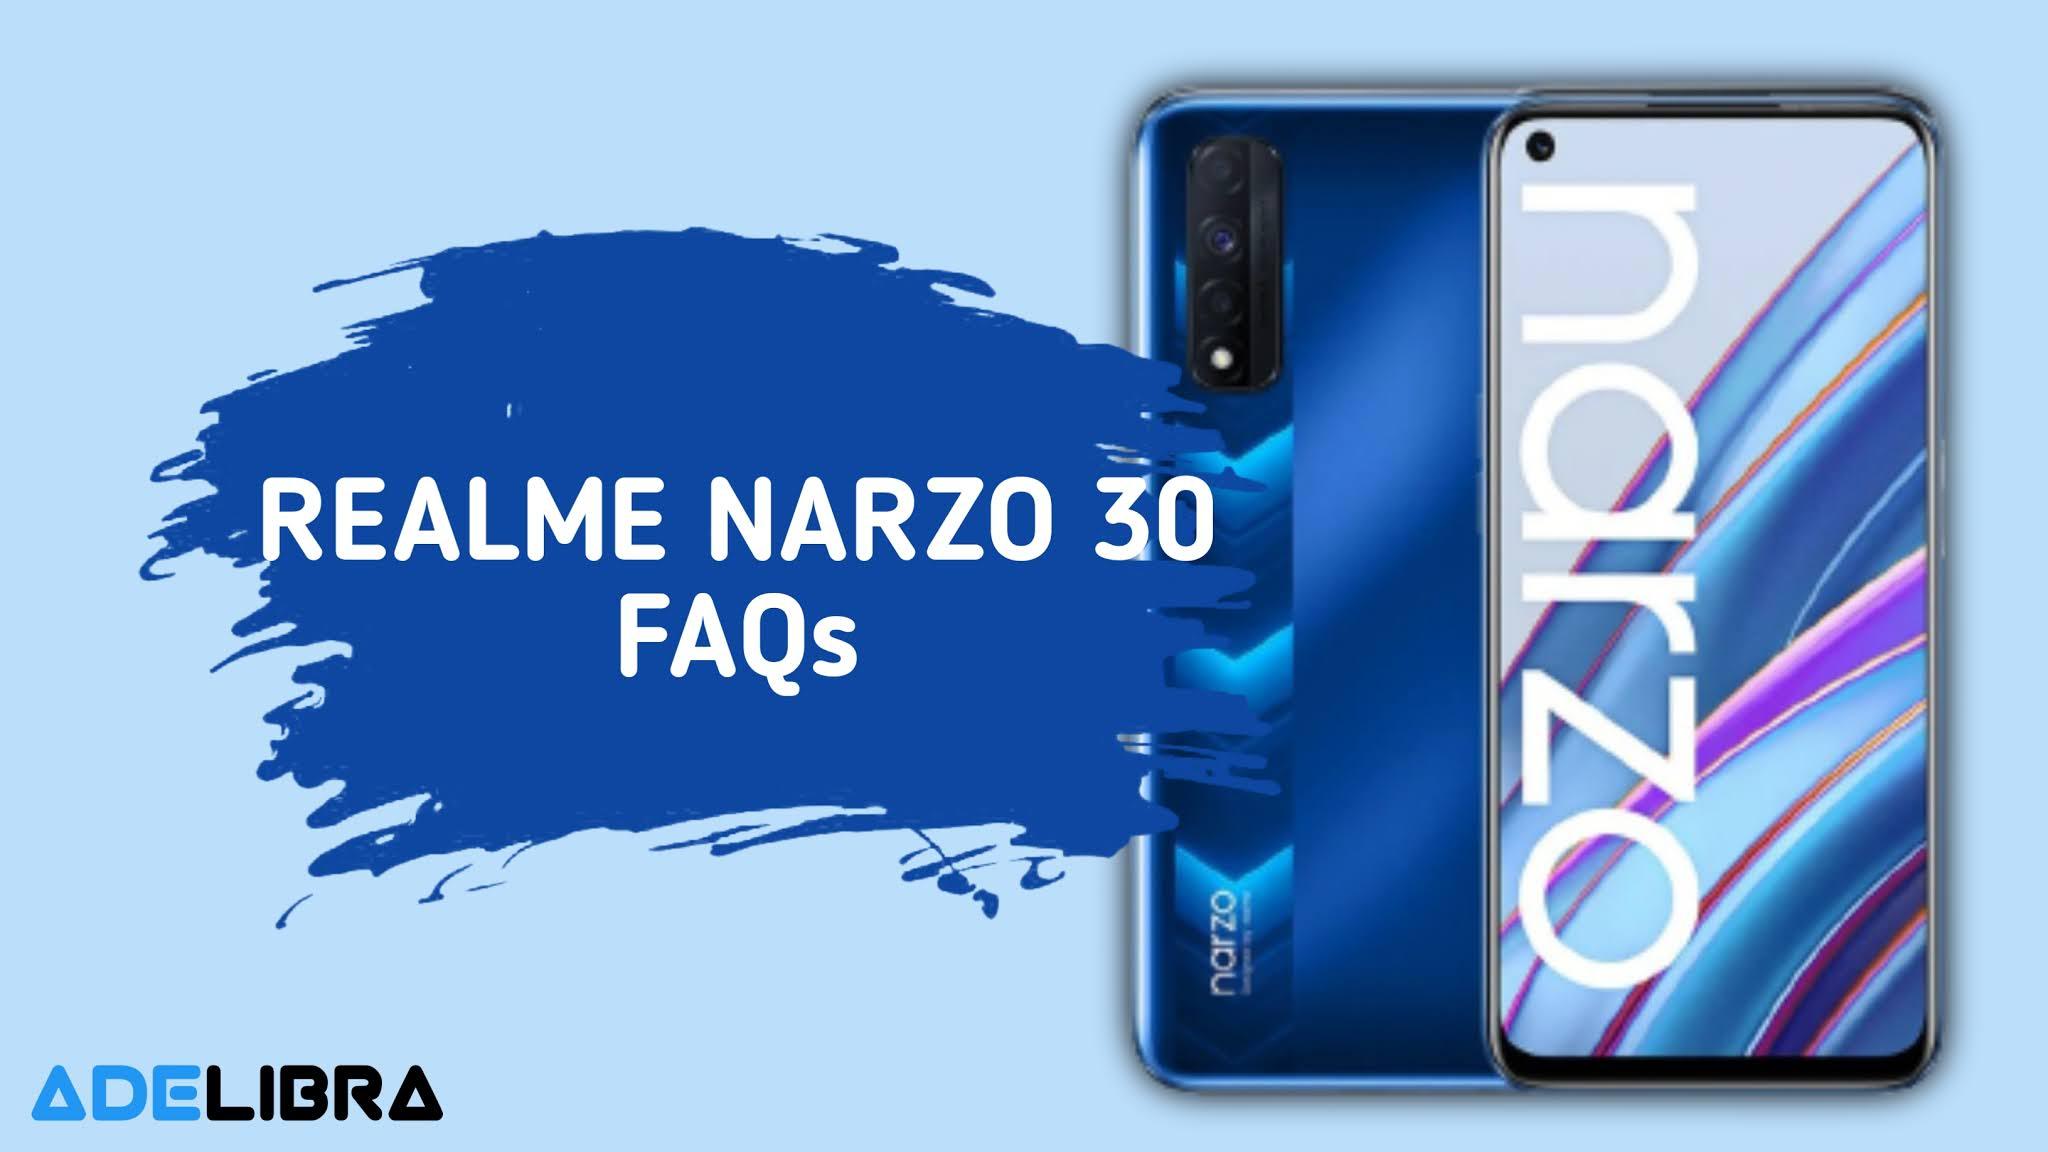 Realme Narzo 30 FAQs